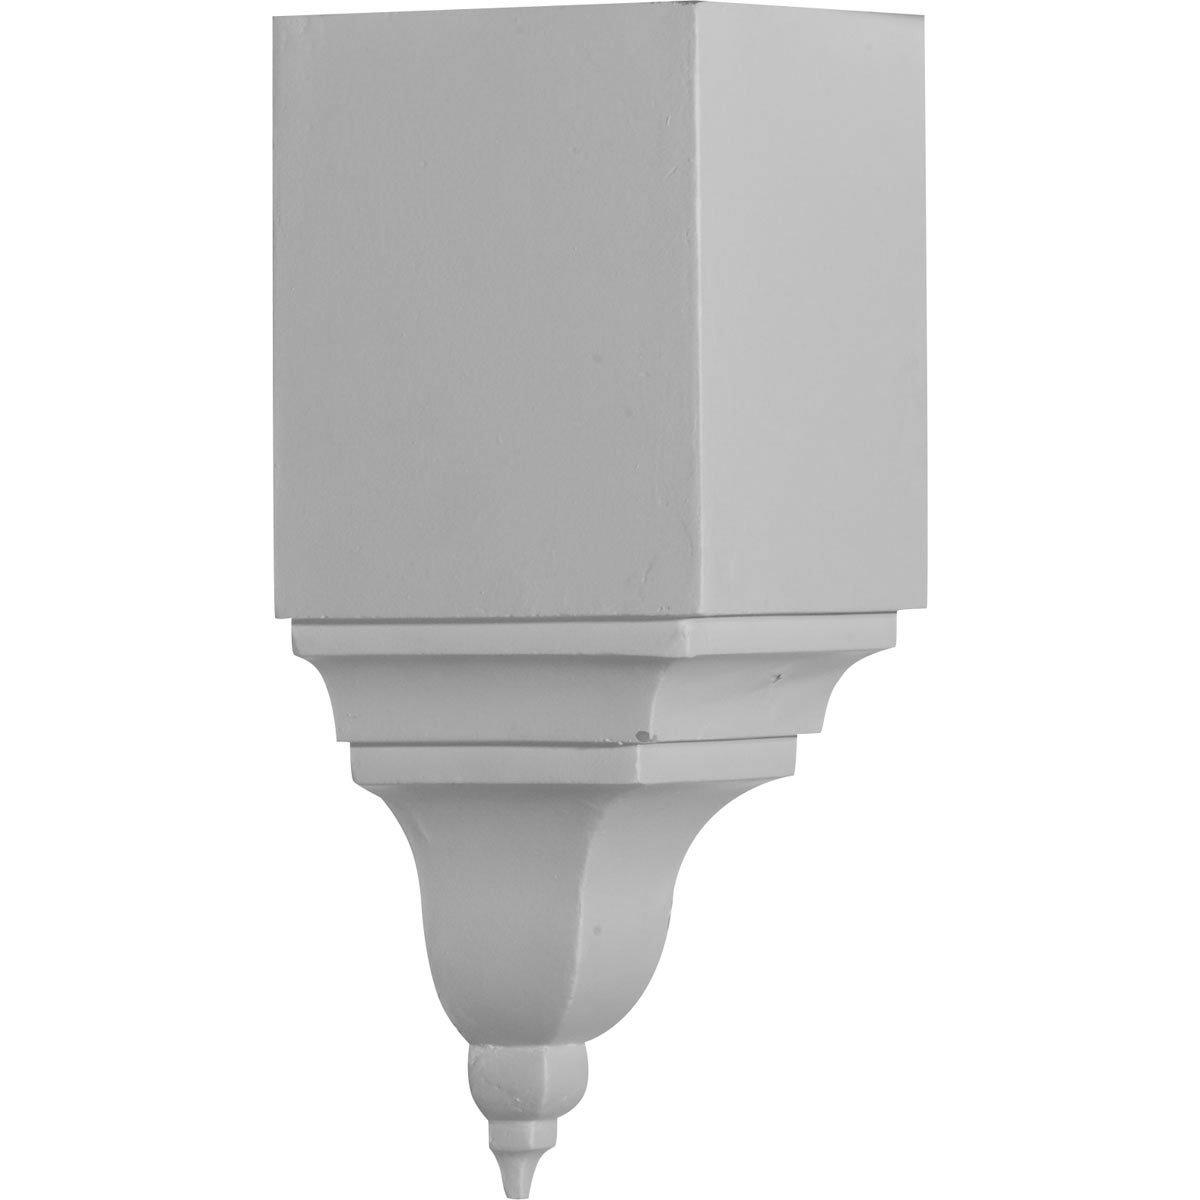 Ekena Millwork MIC05X06BI-CASE-4 5-1/2'' P x 13-3/4'' H Inside Corner for Molding Profiles Less than 5 1/2'' P and 6 3/4'' H (4 Pack)